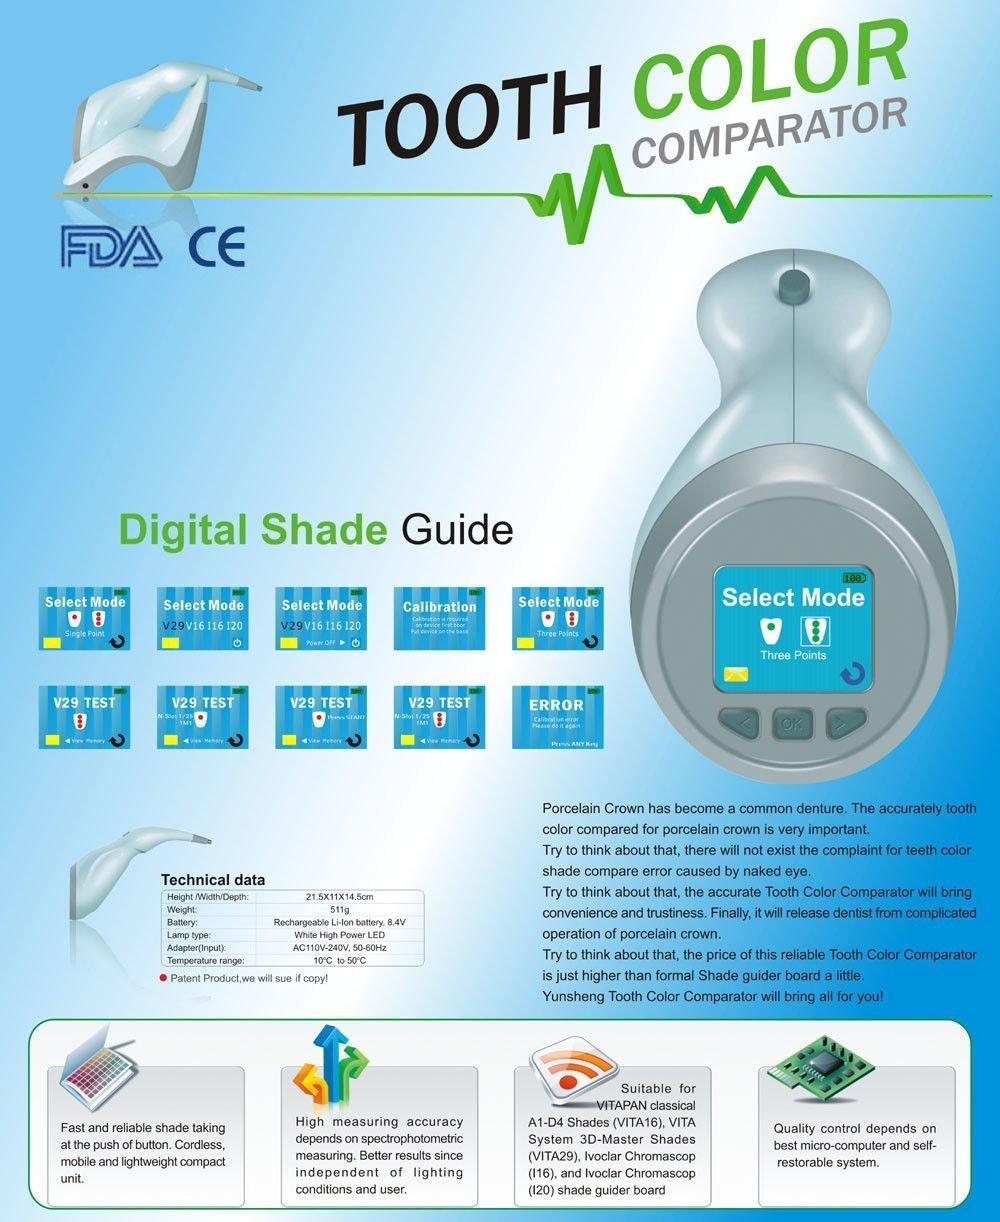 Ruensheng® Dental Digital Shade Guide Ys-tcc-a Tooth Color Comparator for Dentist By King Dental